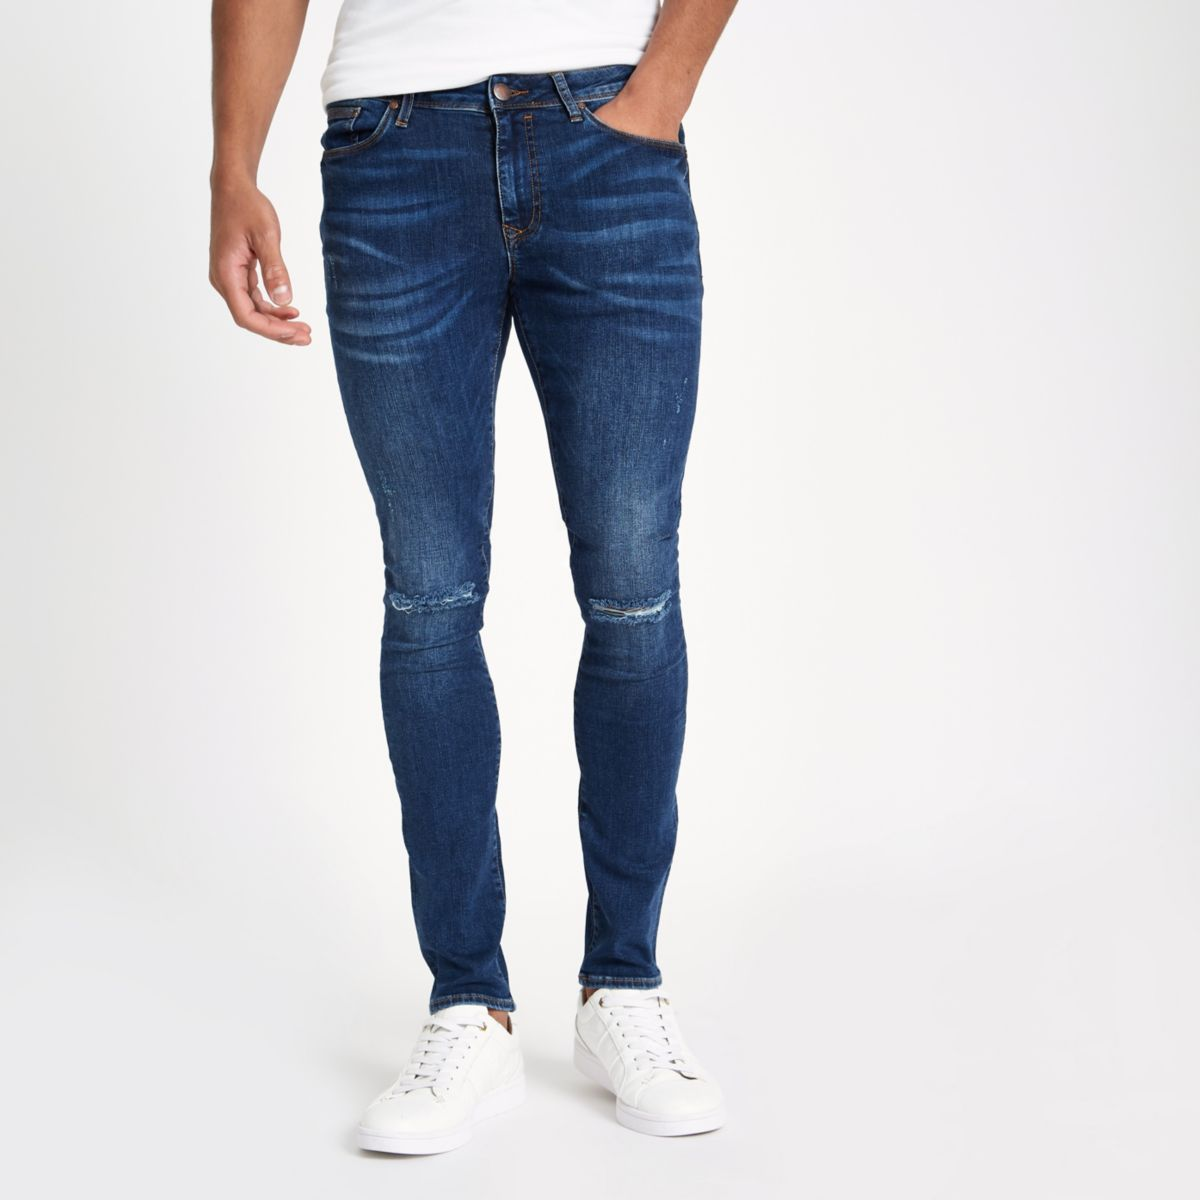 Dark blue denim ripped skinny jeans